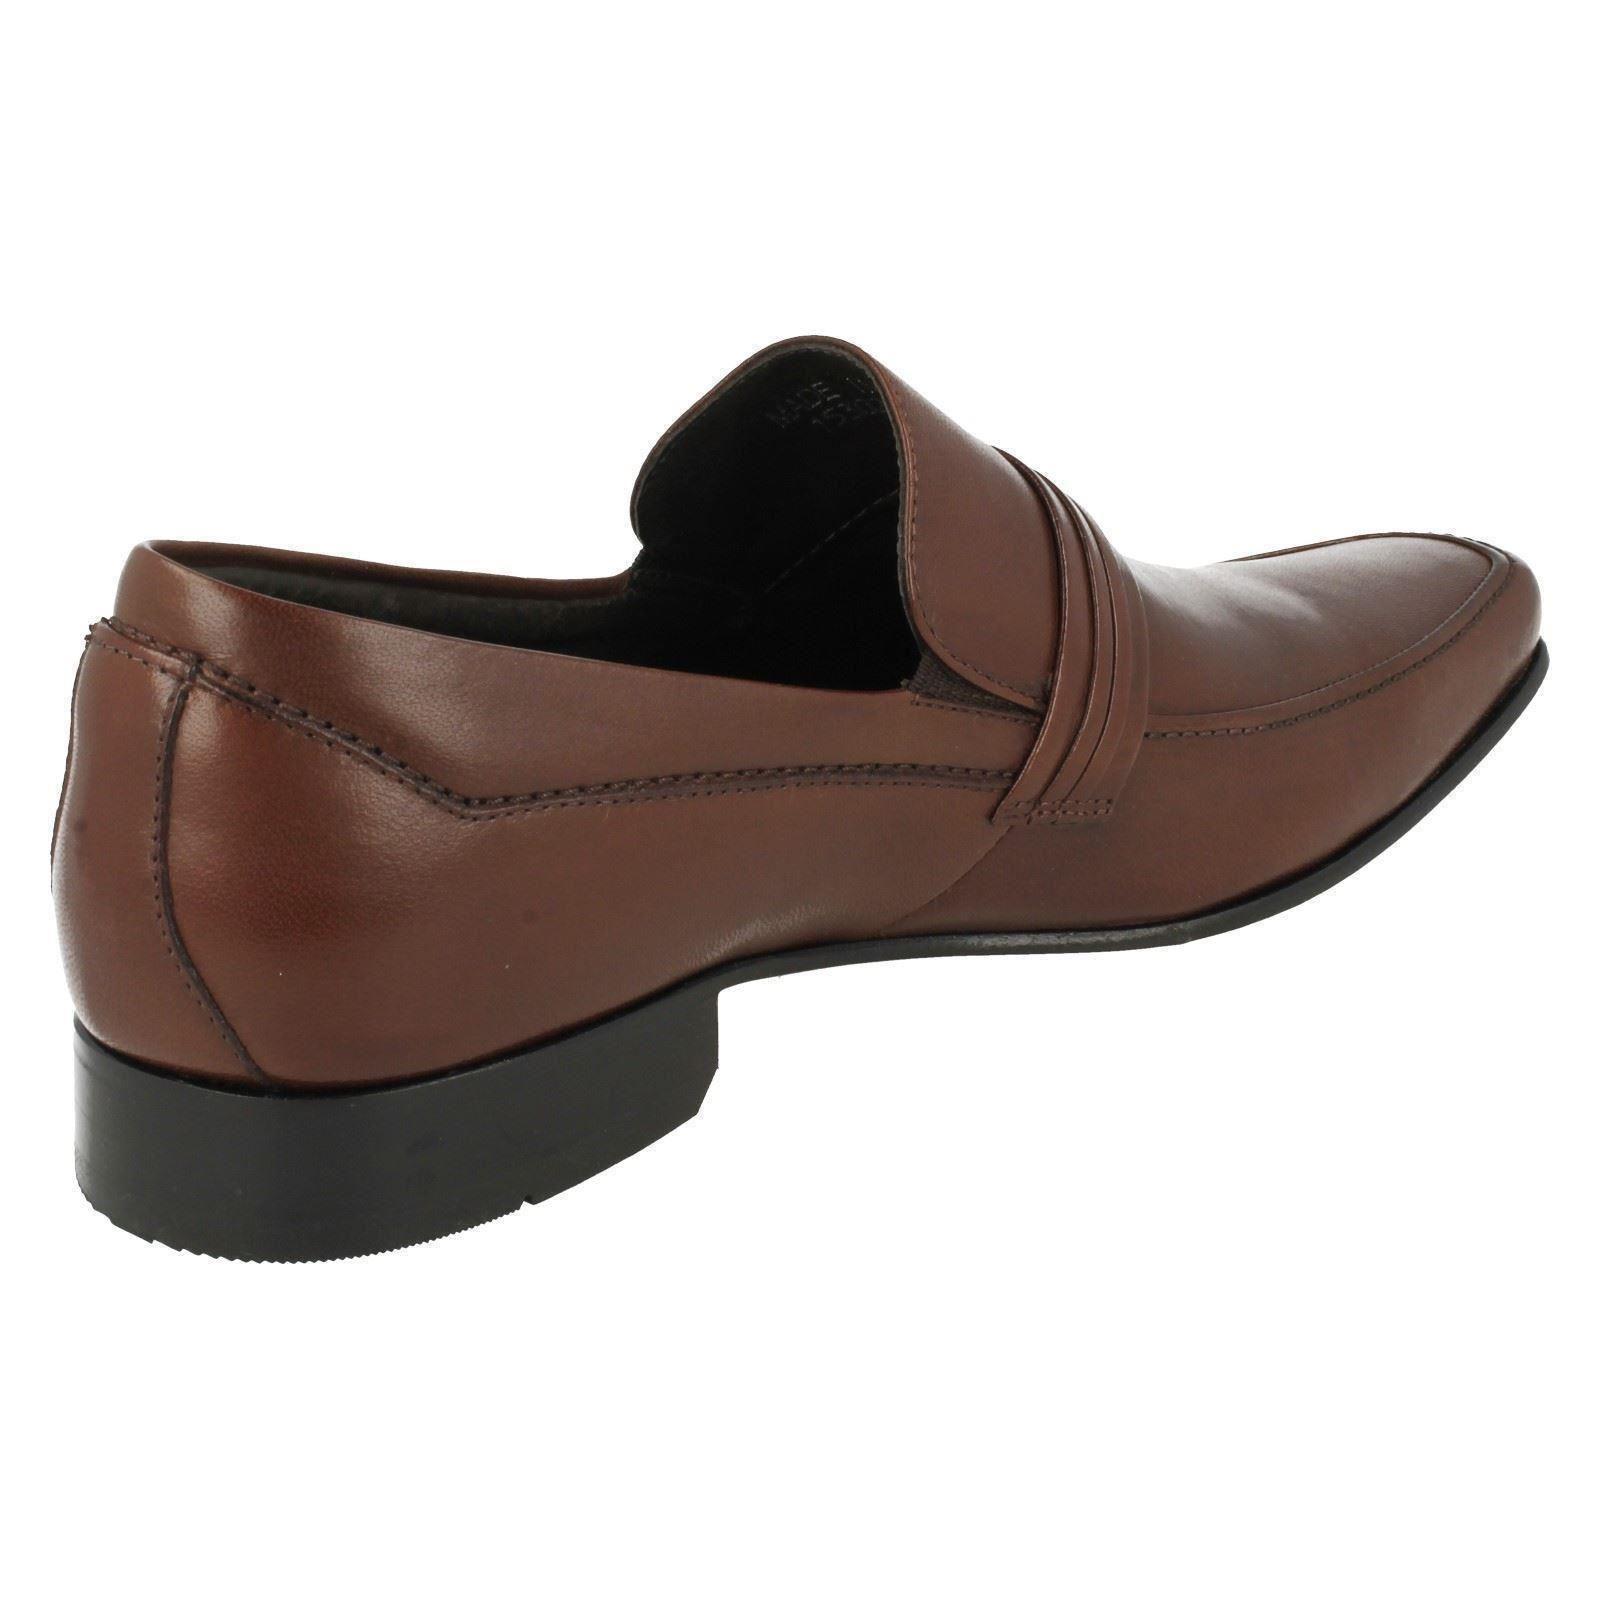 Mens Anatomic Formal 2-W Slip On Shoes Goiana 2-W Formal d3ee5d